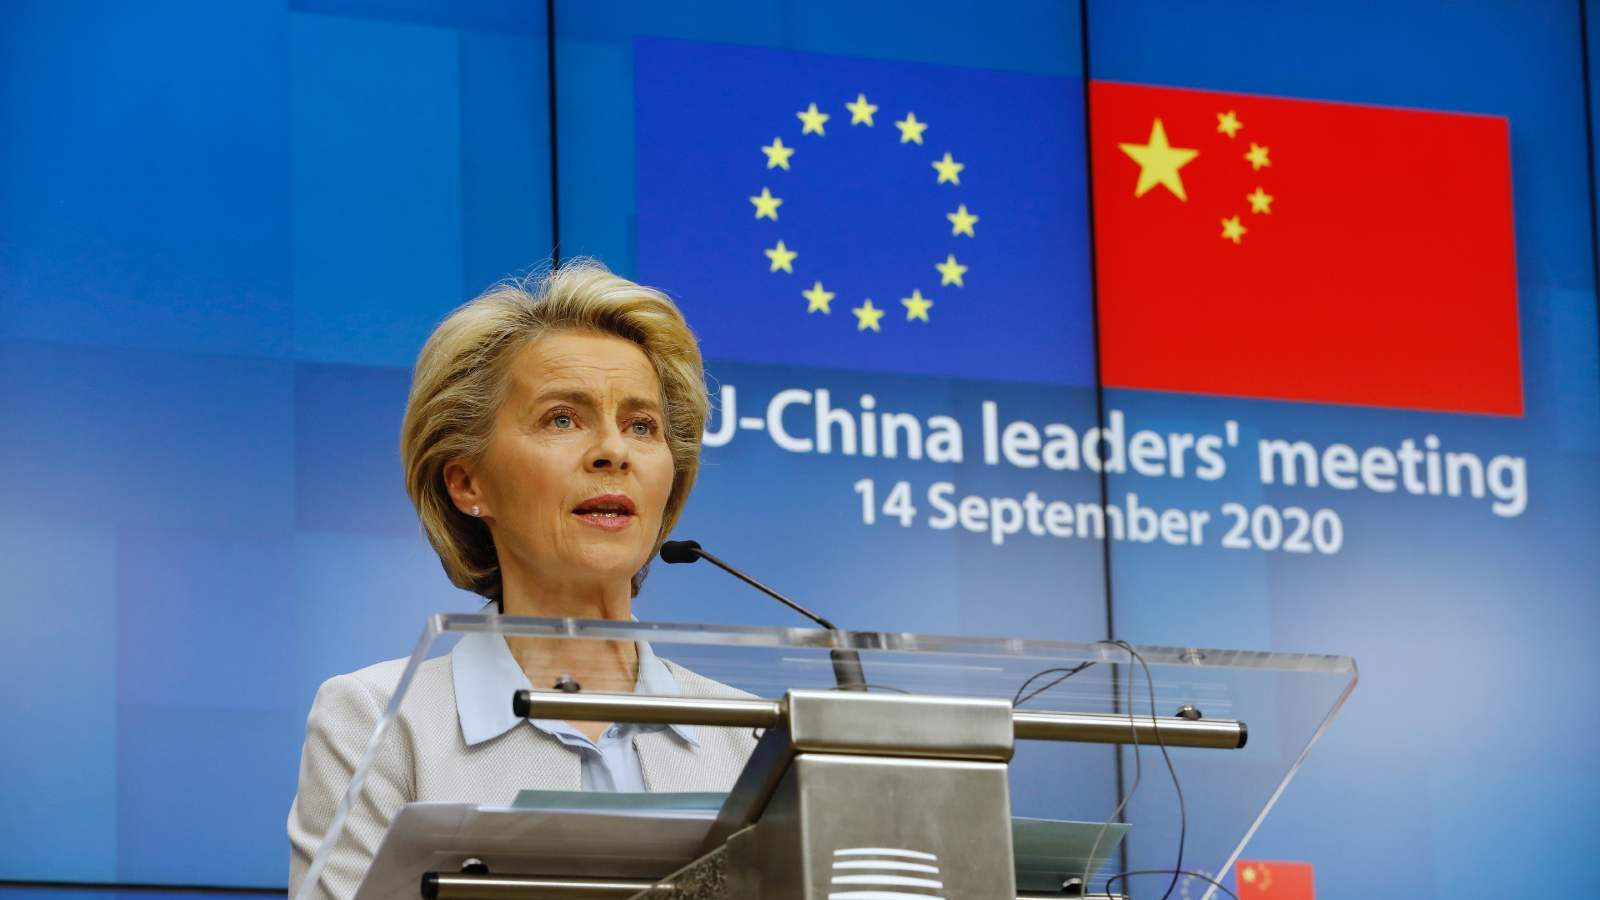 Ms Ursula VON DER LEYEN, President of the European Commission. EU-China leaders' meeting - September 2020